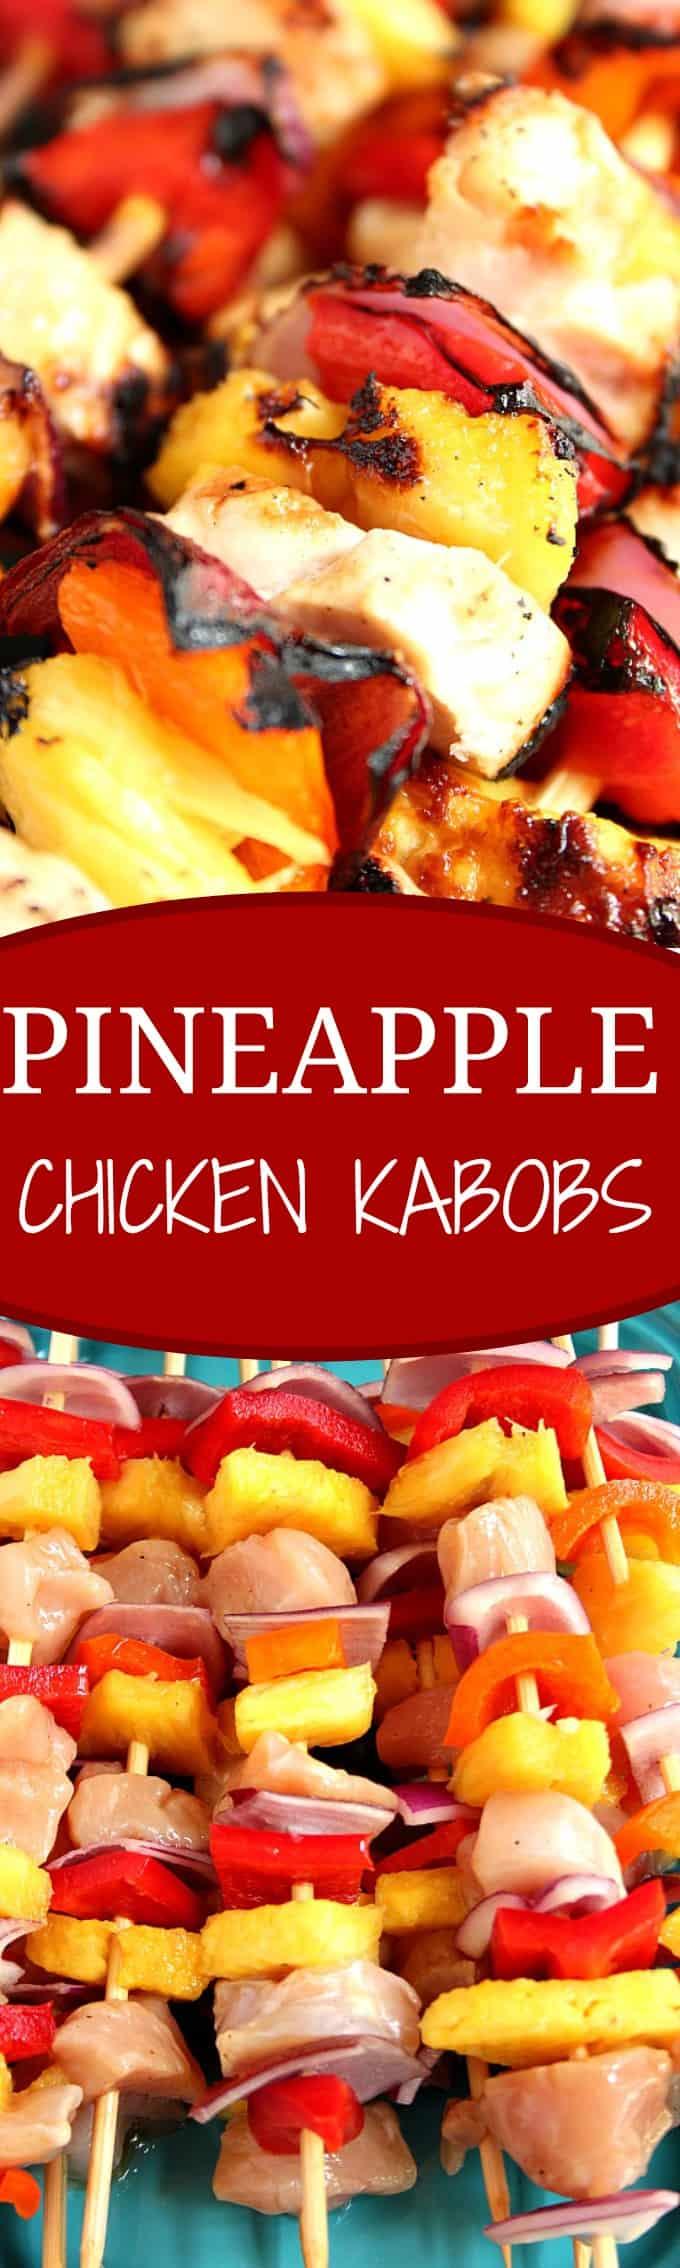 Pineapple Chicken Kabobs RecipeCrunchy Creamy Sweet